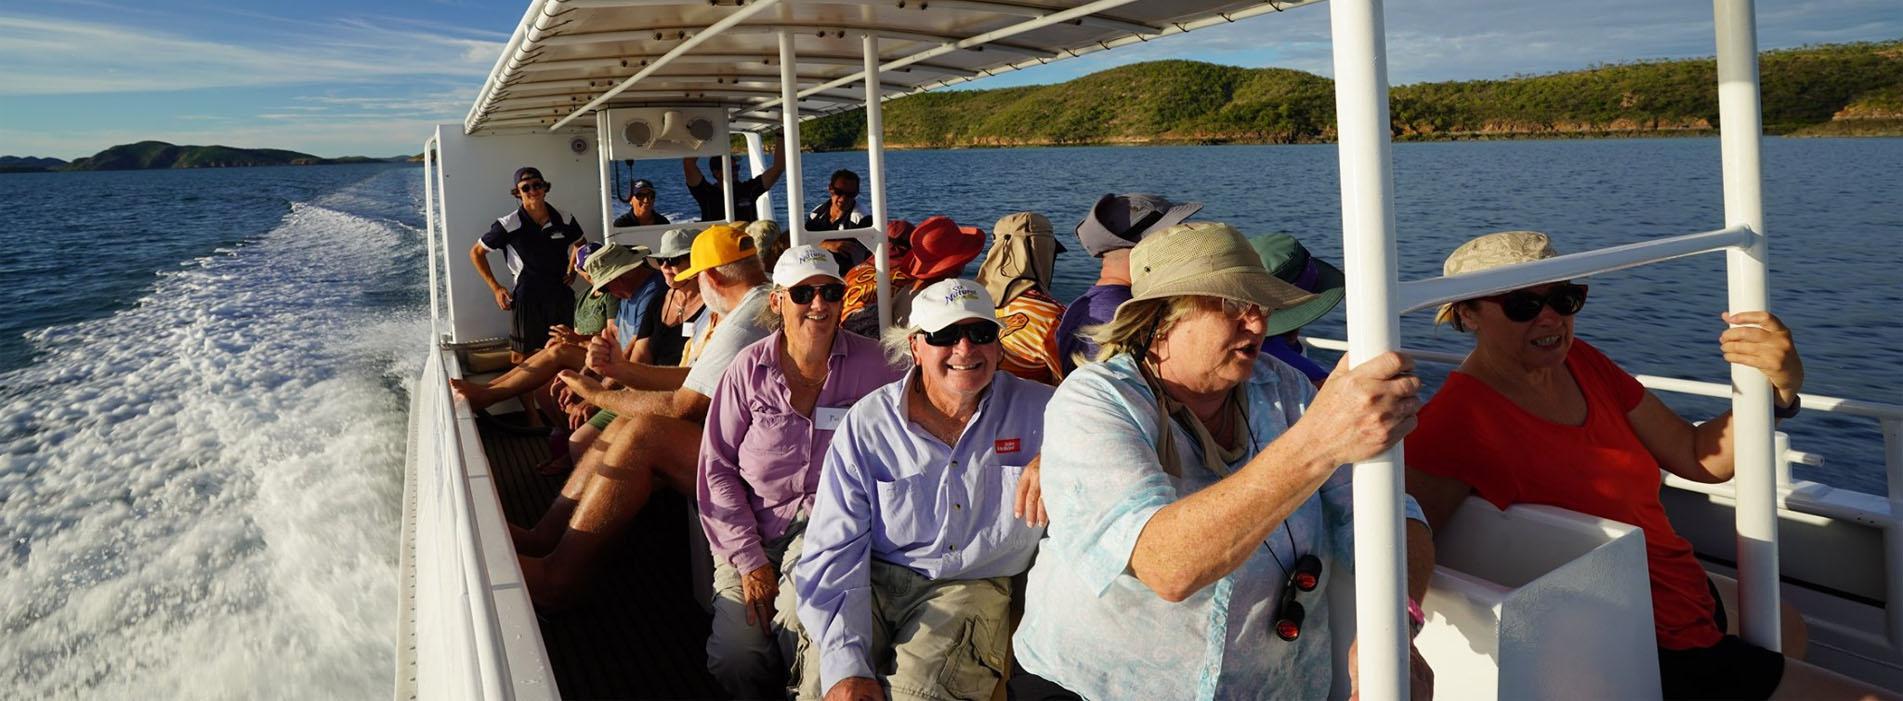 ODYSSEY kimberley cruises Homer tender vessel